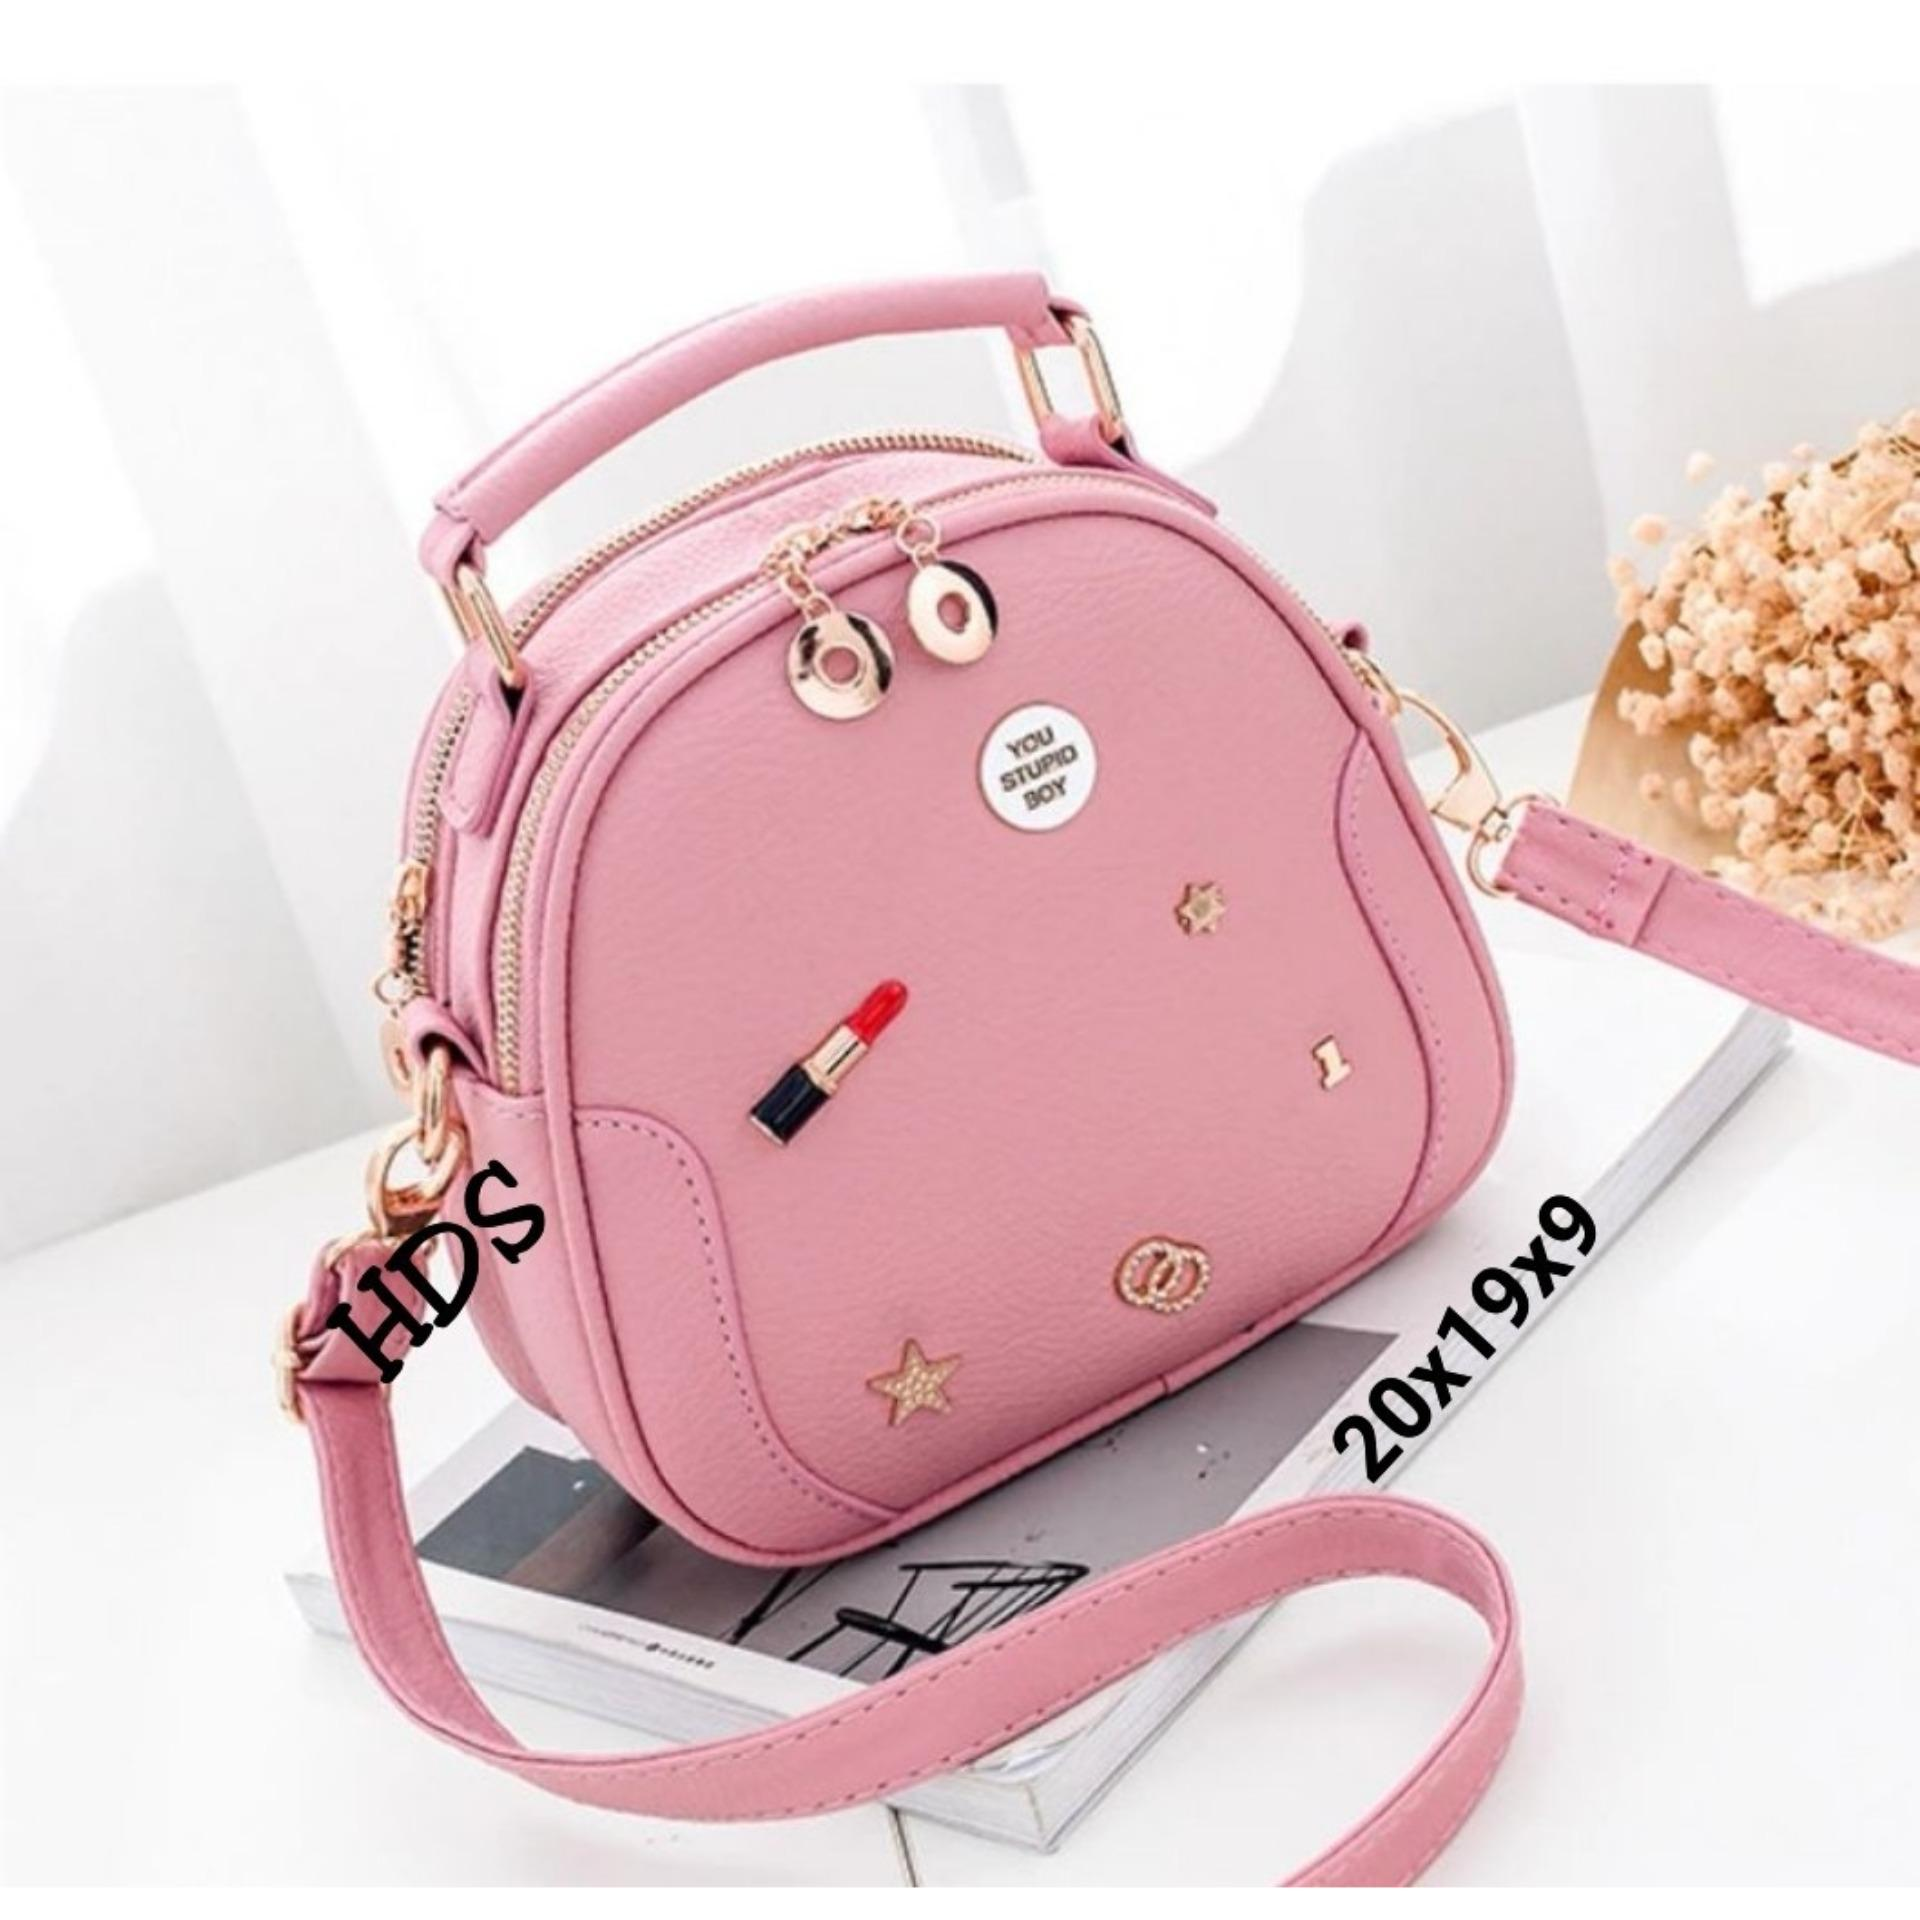 Info Harga Promo Berbagai Produk Page 118 Temukan Tas Selempang Wanita Manggo Bags Sling Bag Korean Style Lipstick Flakes Ovale Pink